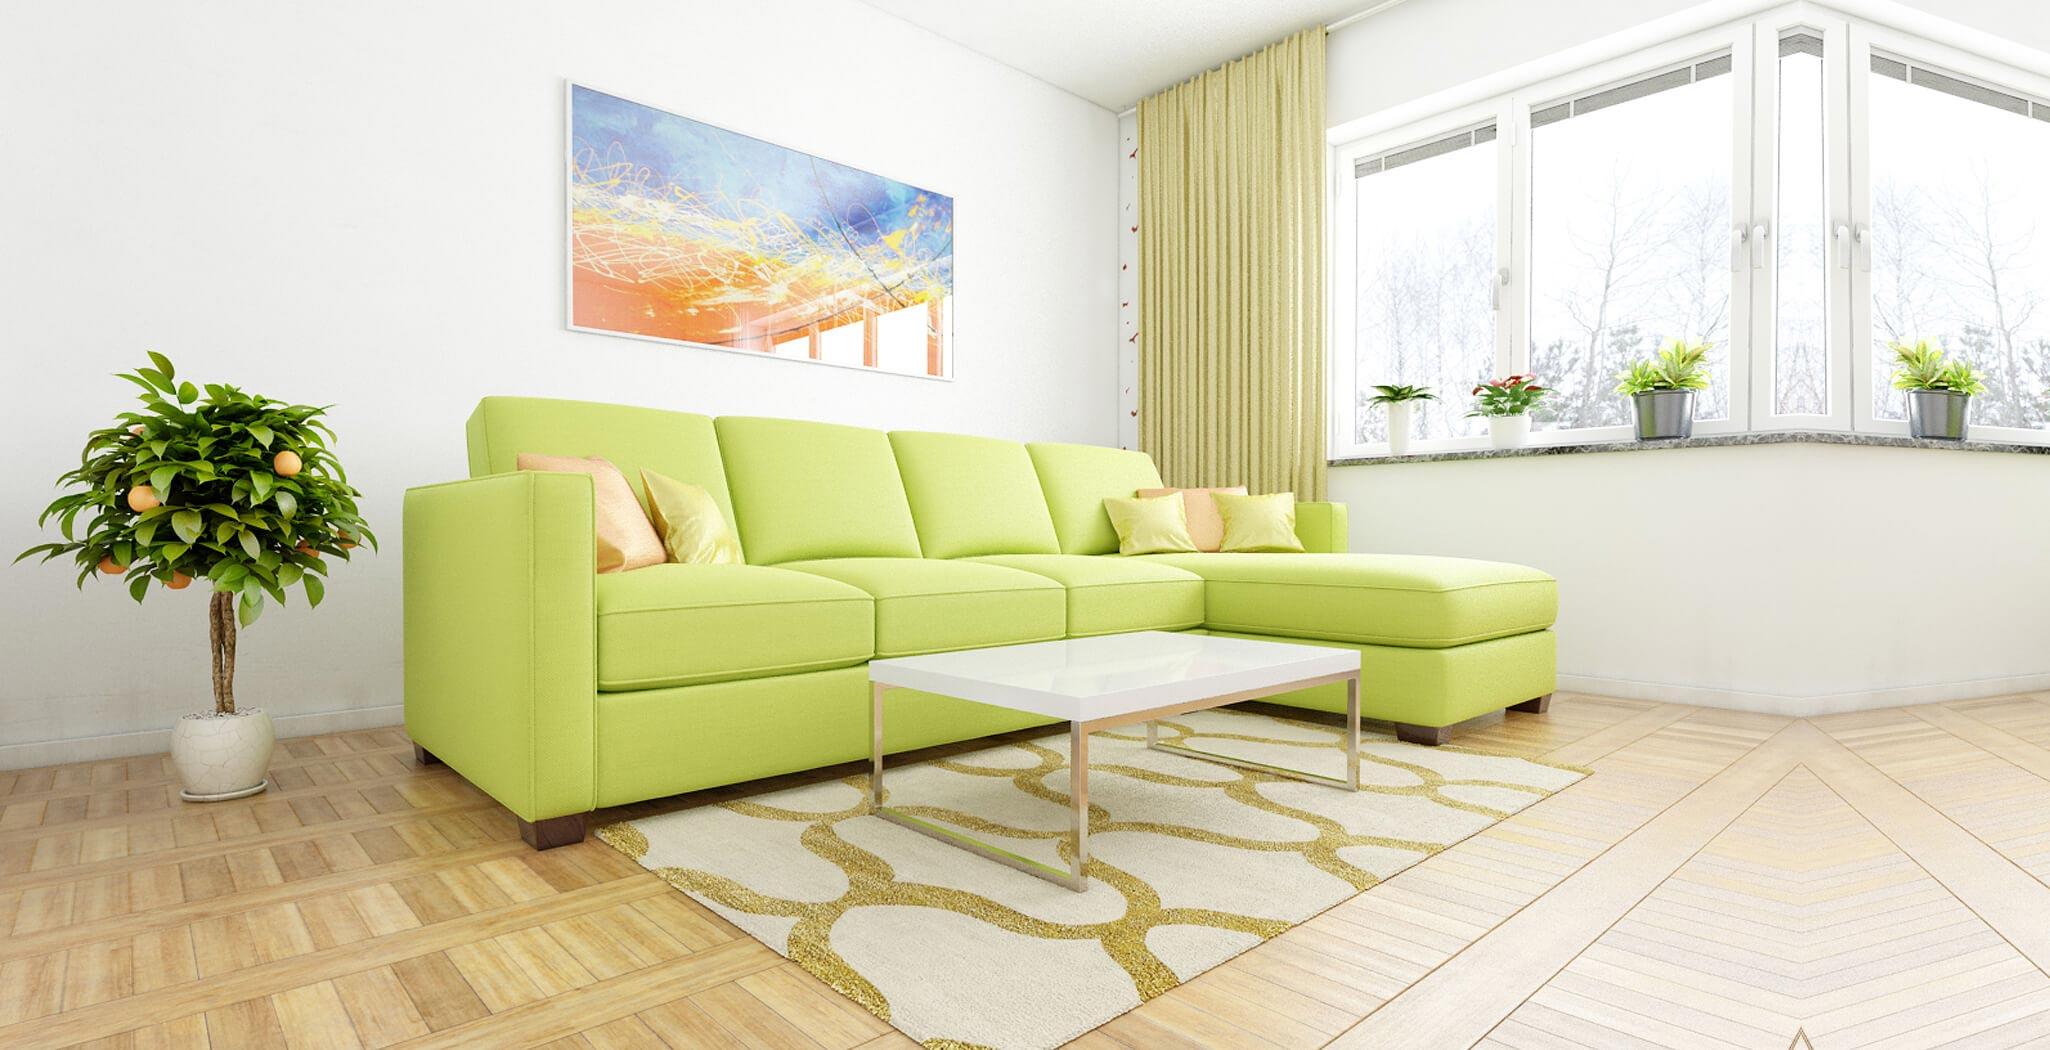 calgary panel furniture gallery 3